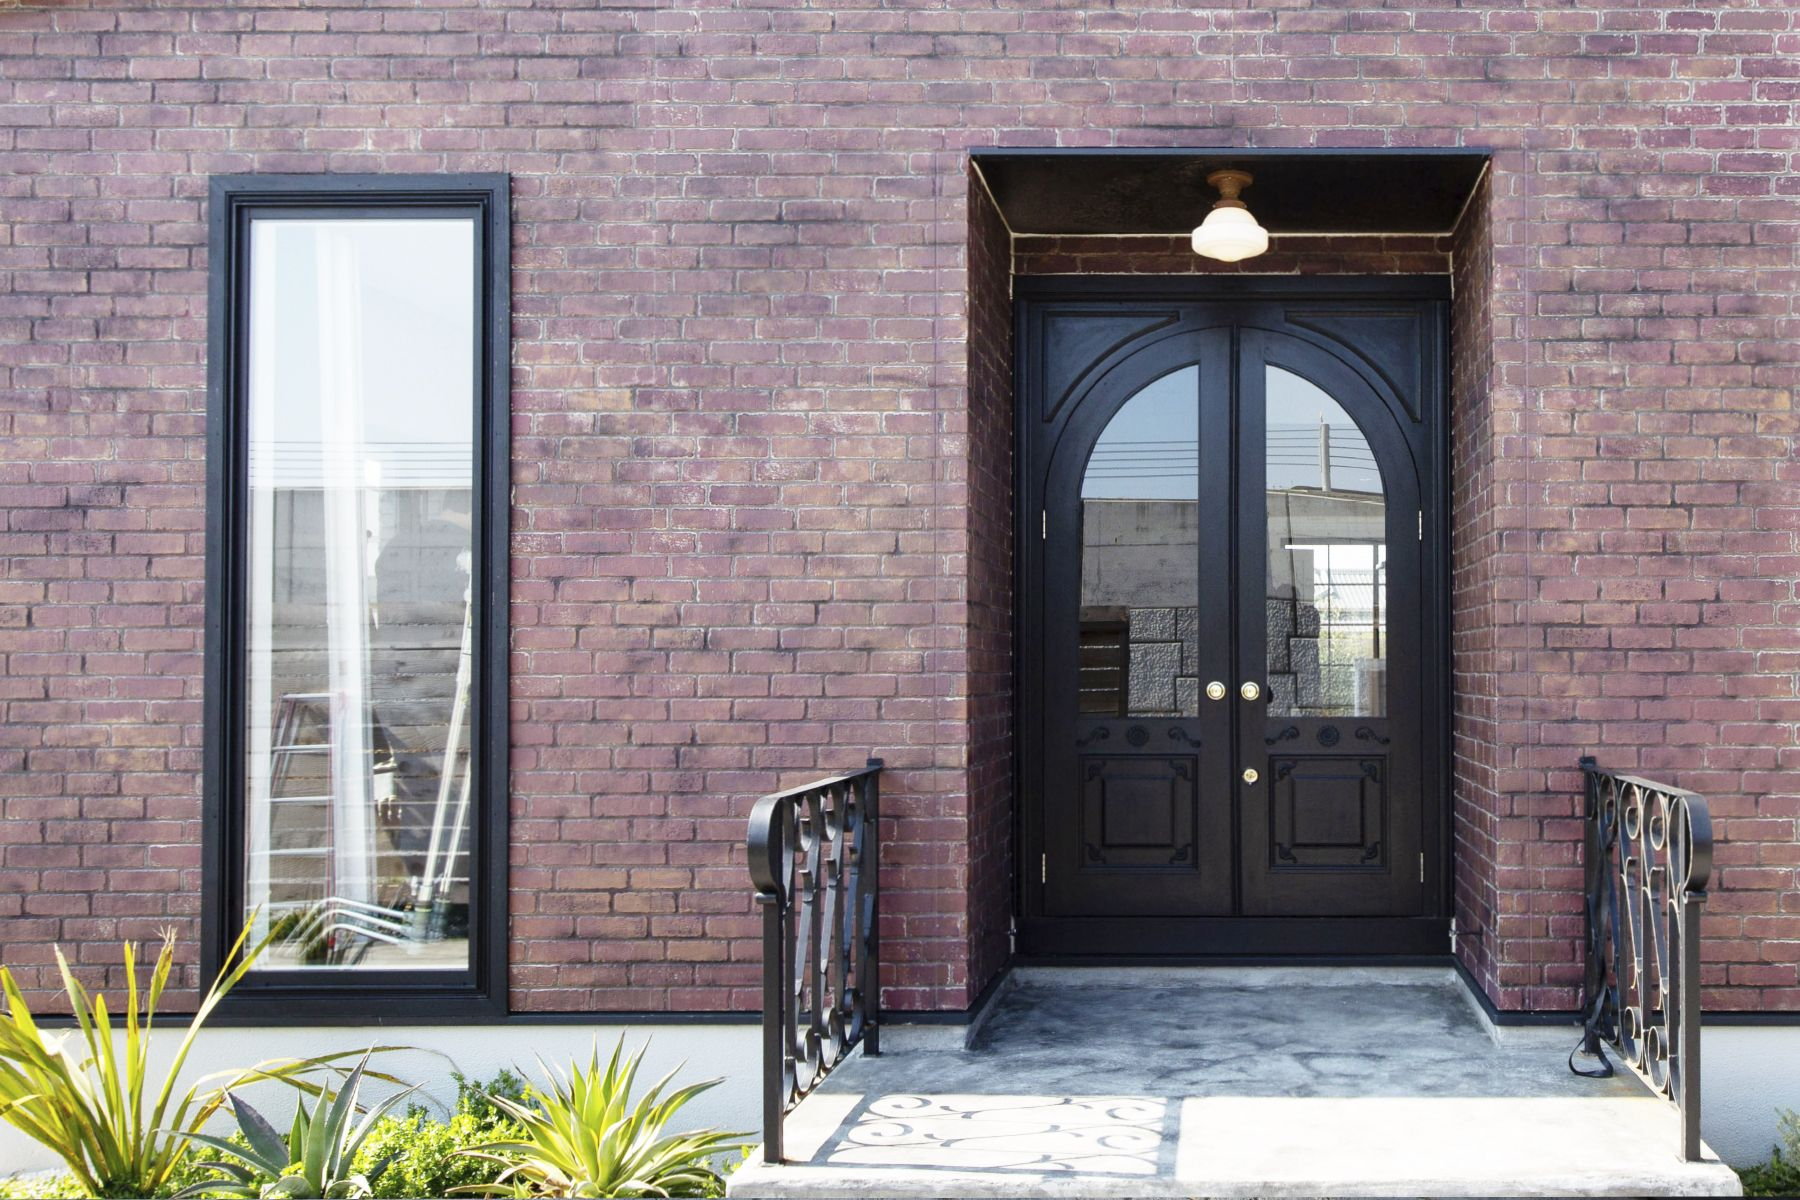 Studio One Kujyukuri Beach (スタジオ ワン クジュウクリ ビーチ)玄関:重厚感のあるドア